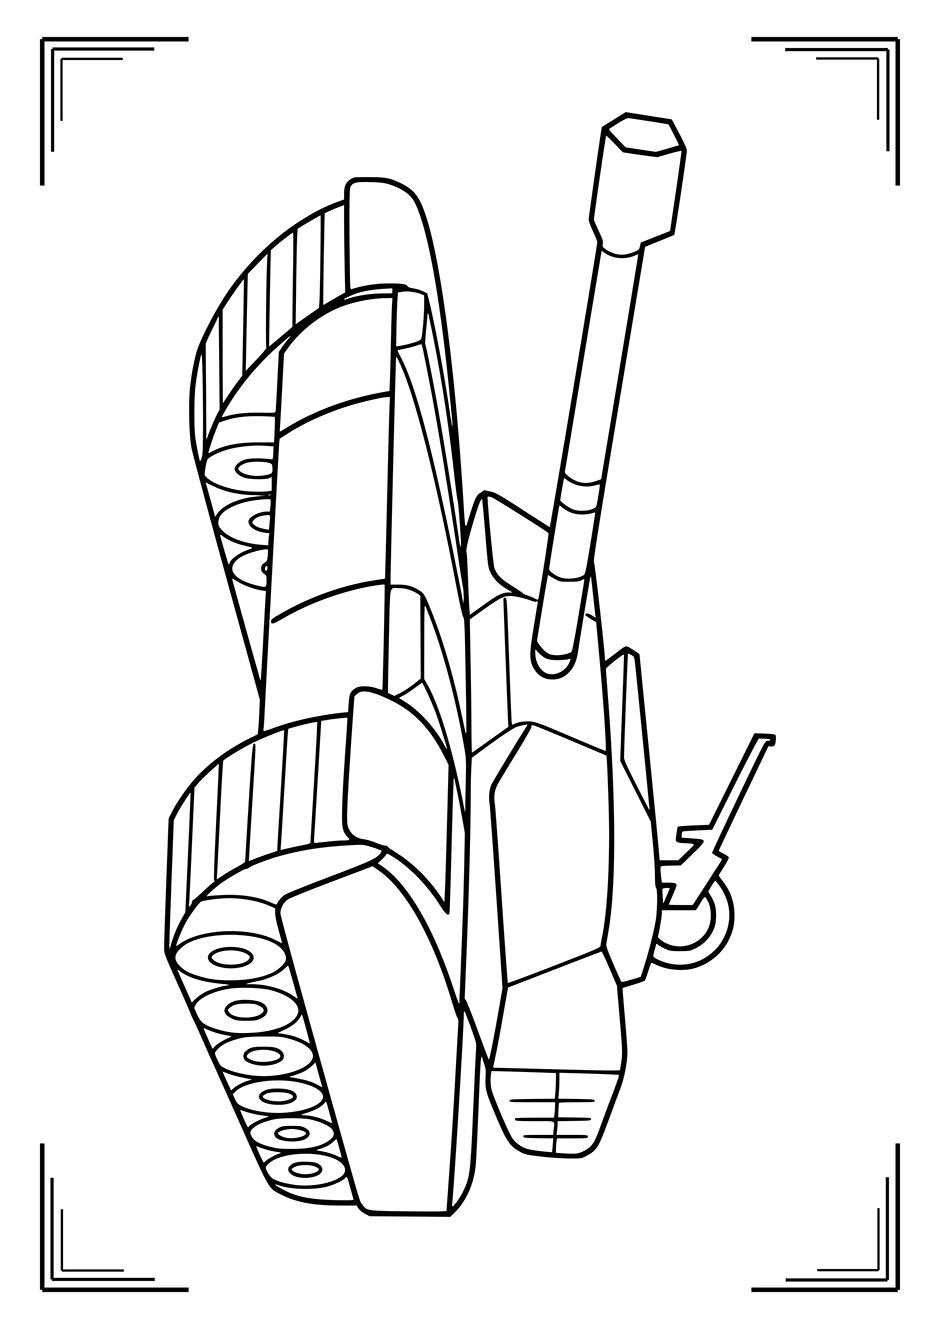 Раскраска: танк с пулеметом на башне — raskraski-a4.ru